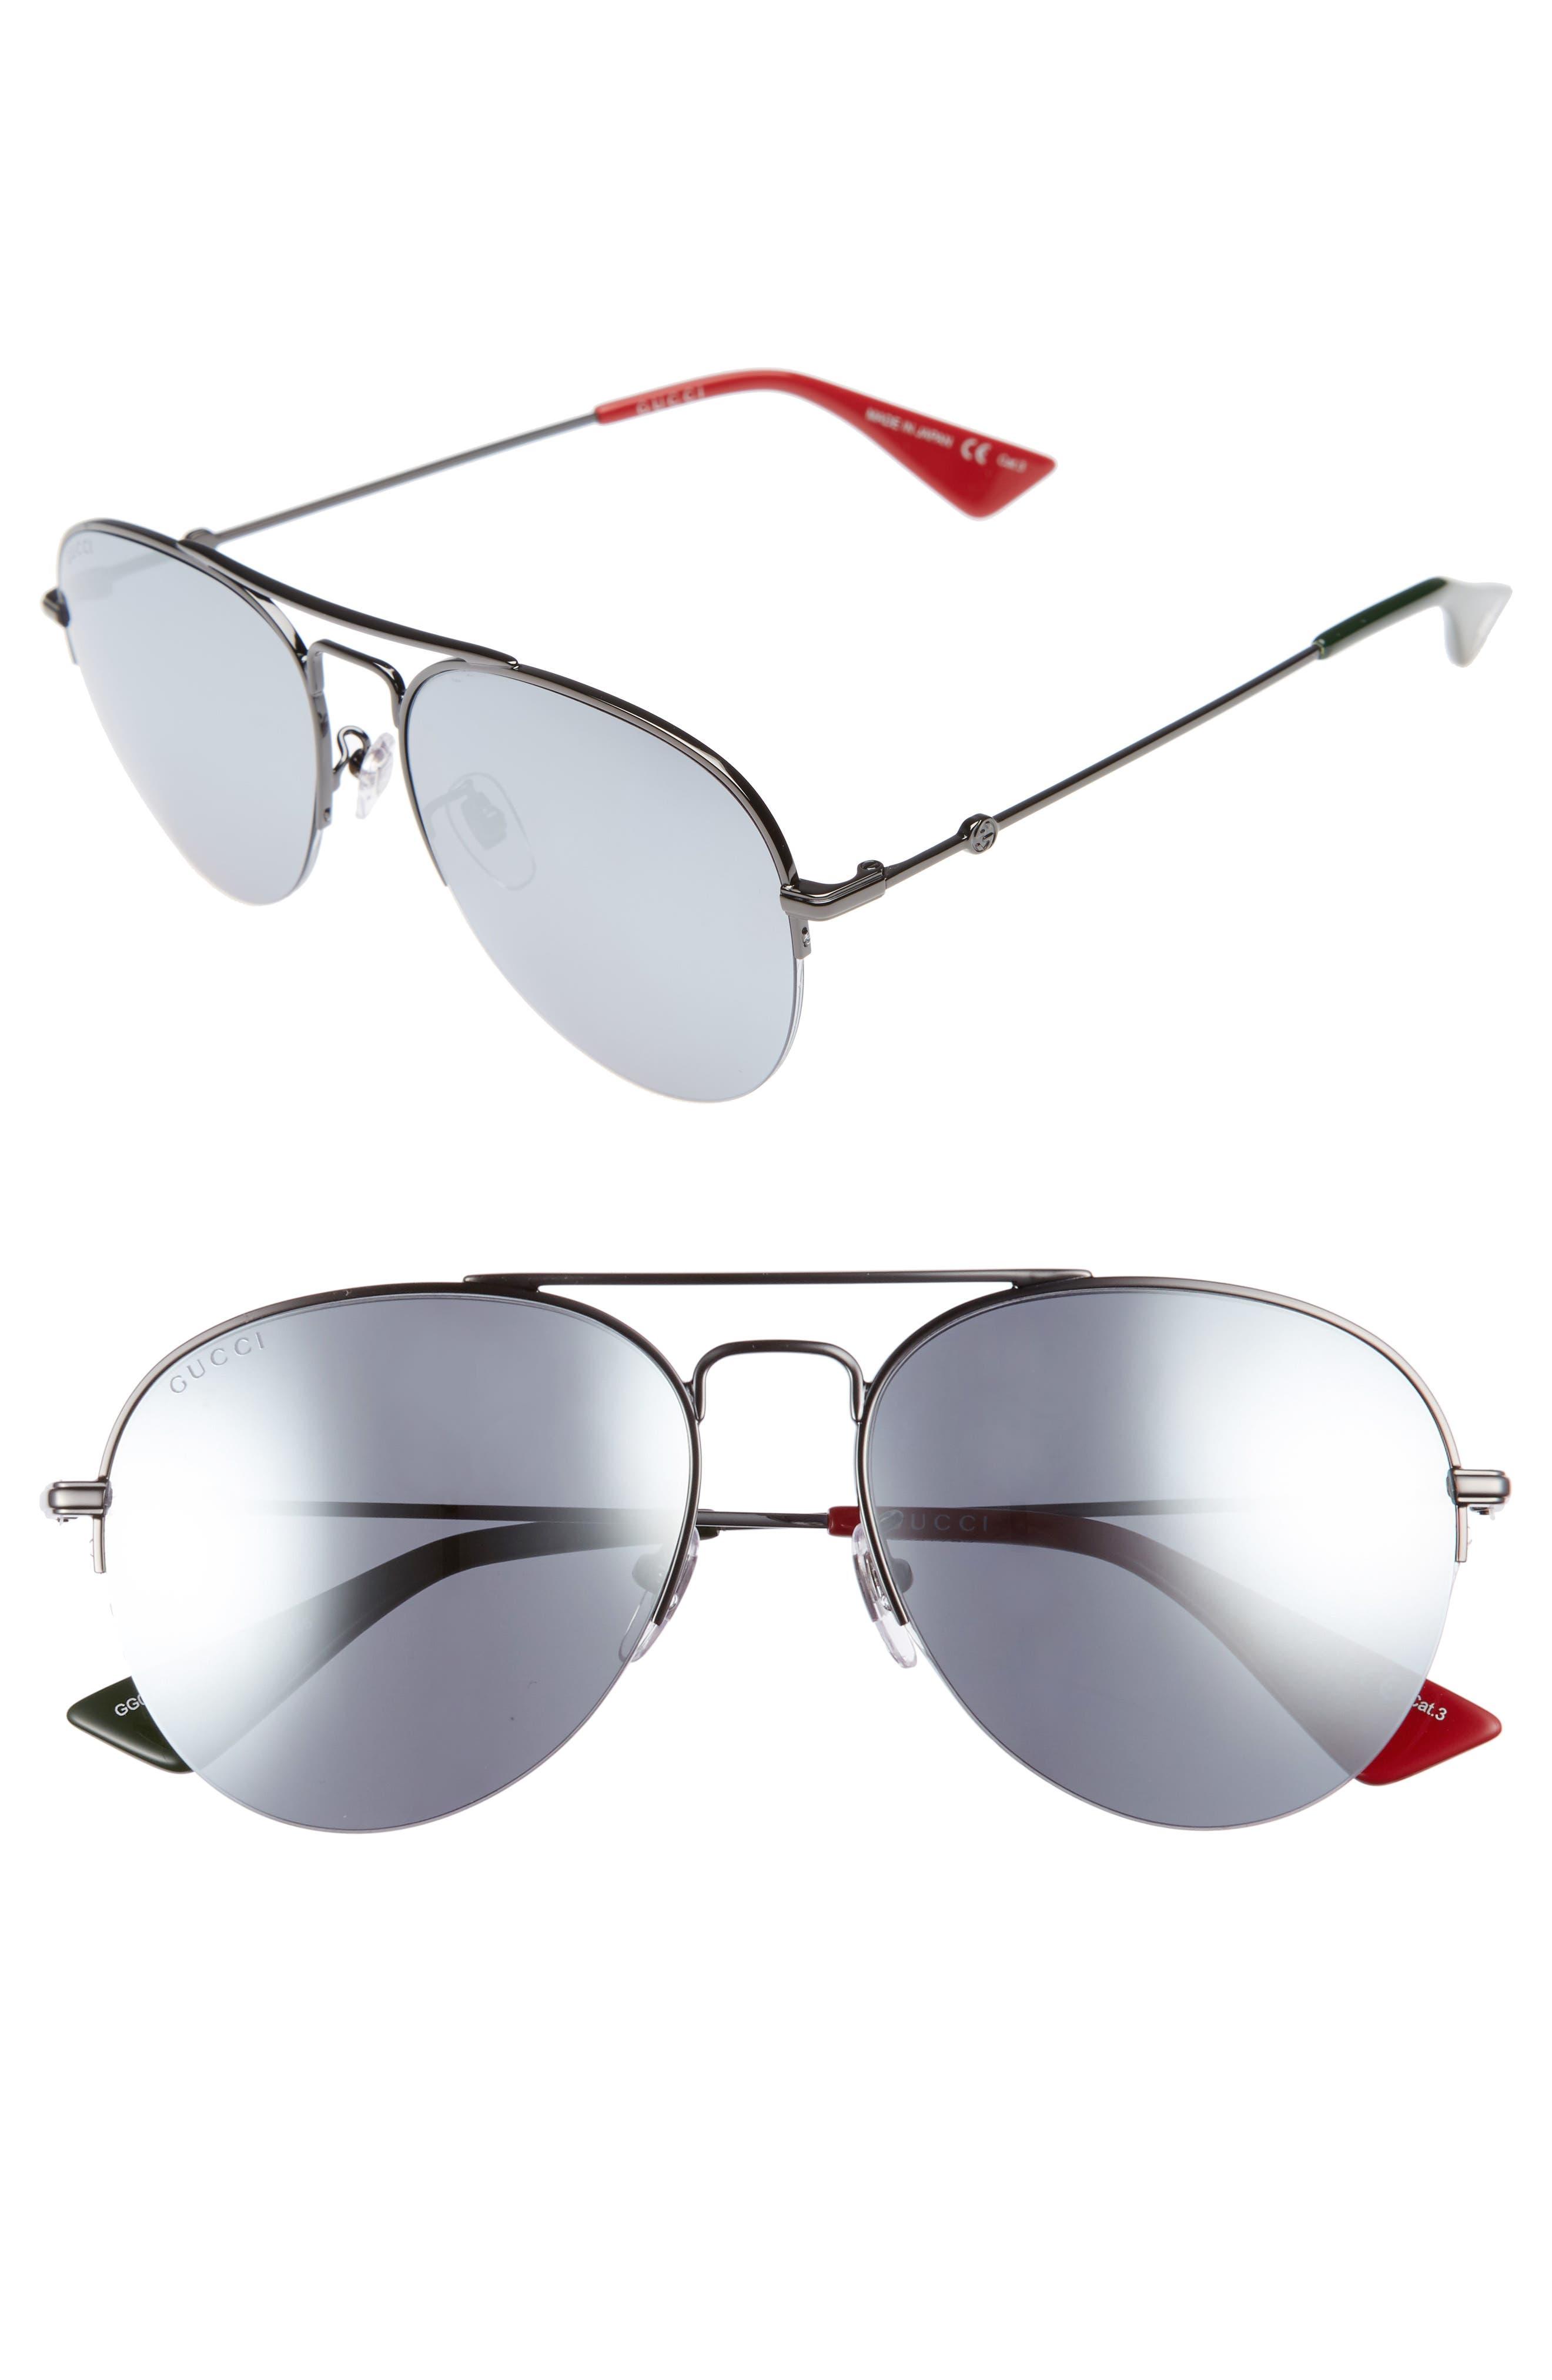 Pilot 56mm Aviator Sunglasses,                         Main,                         color, 052